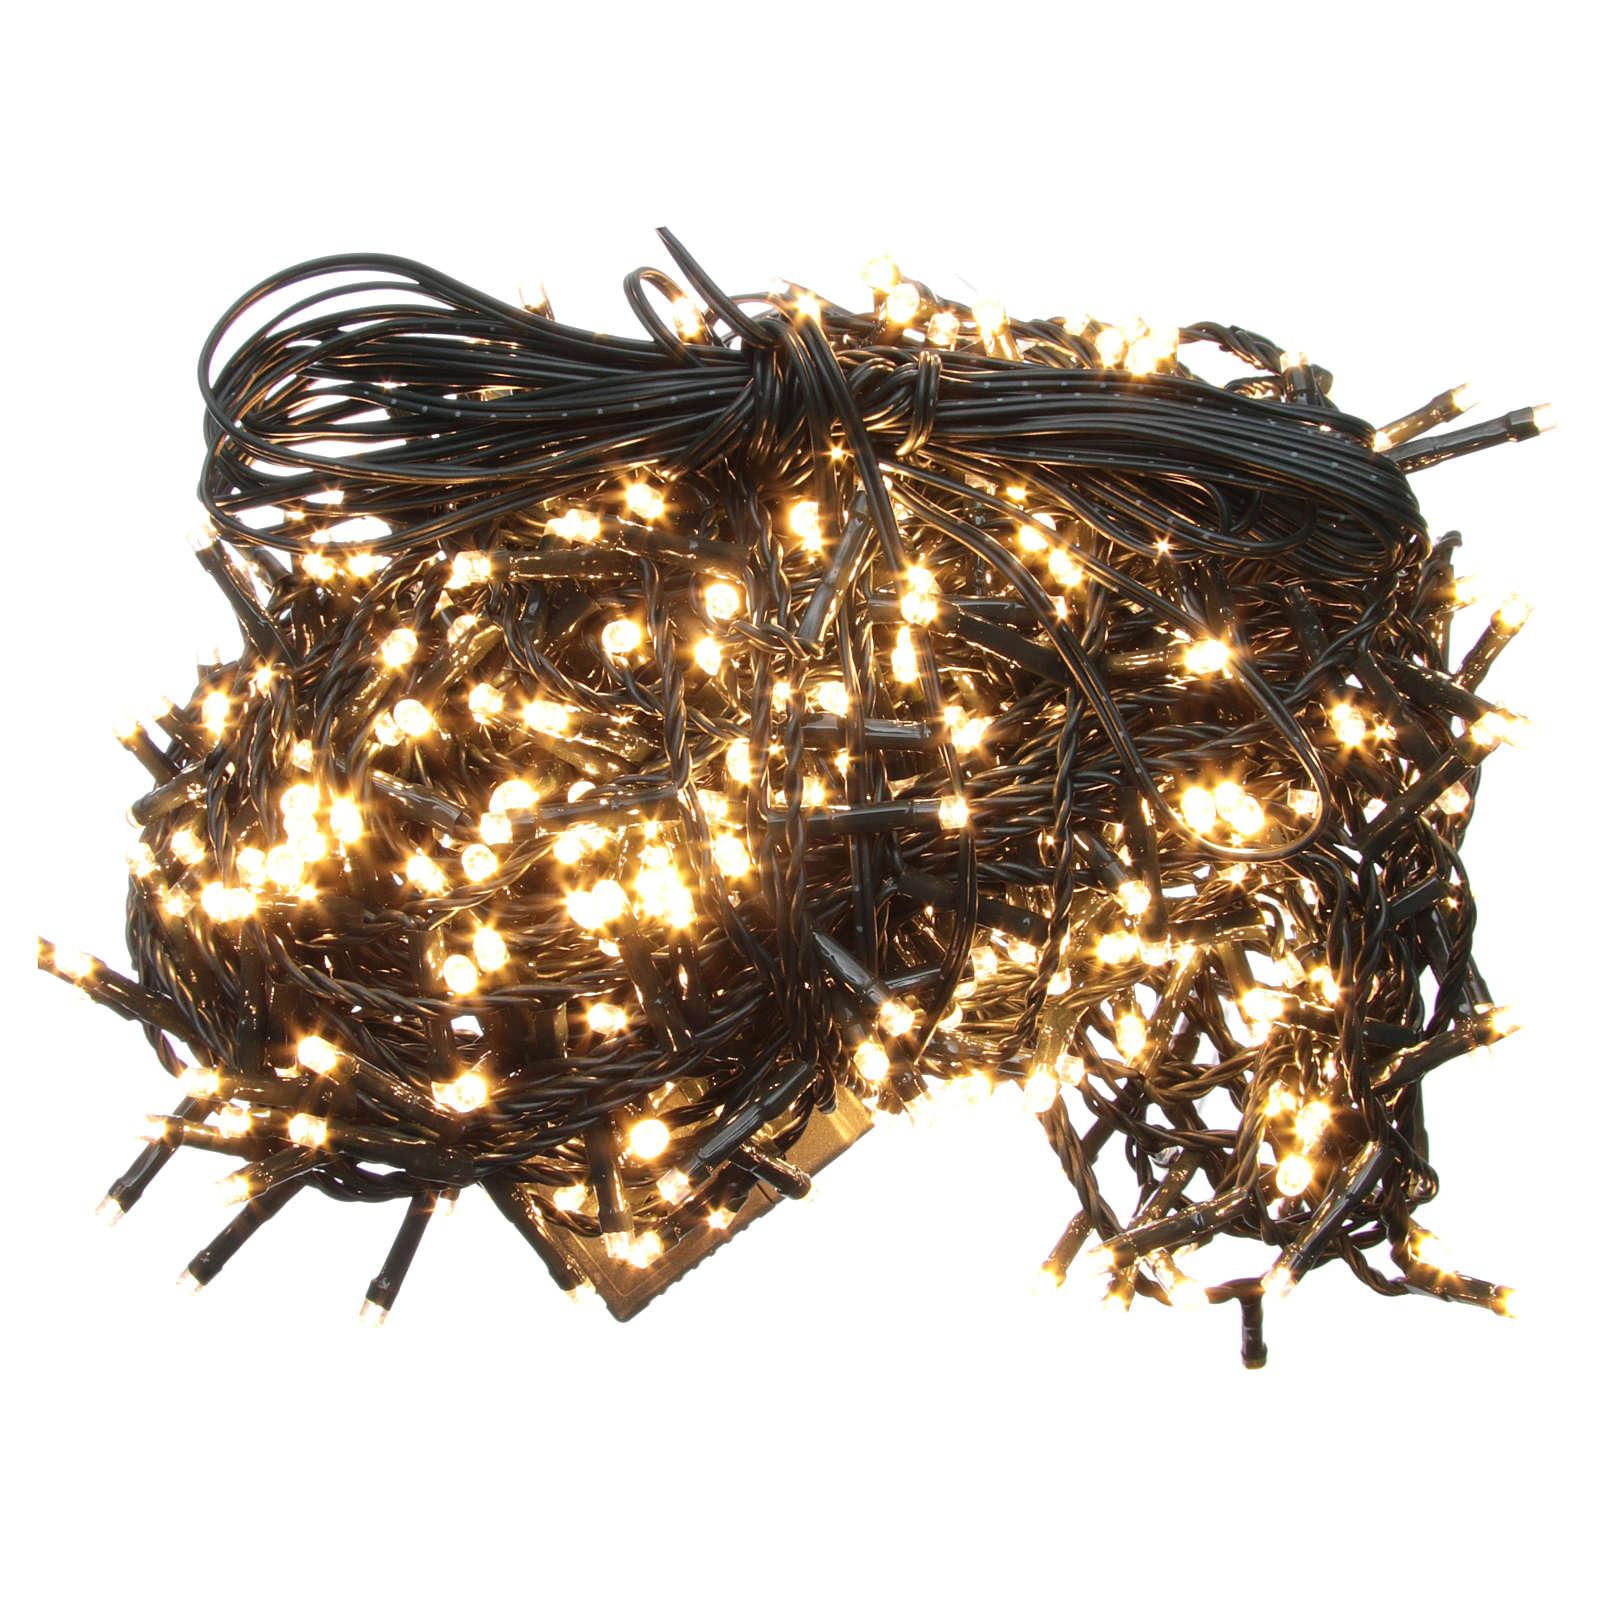 Luce Natale catena 600 LED bianco caldo ESTERNO programmabili 3